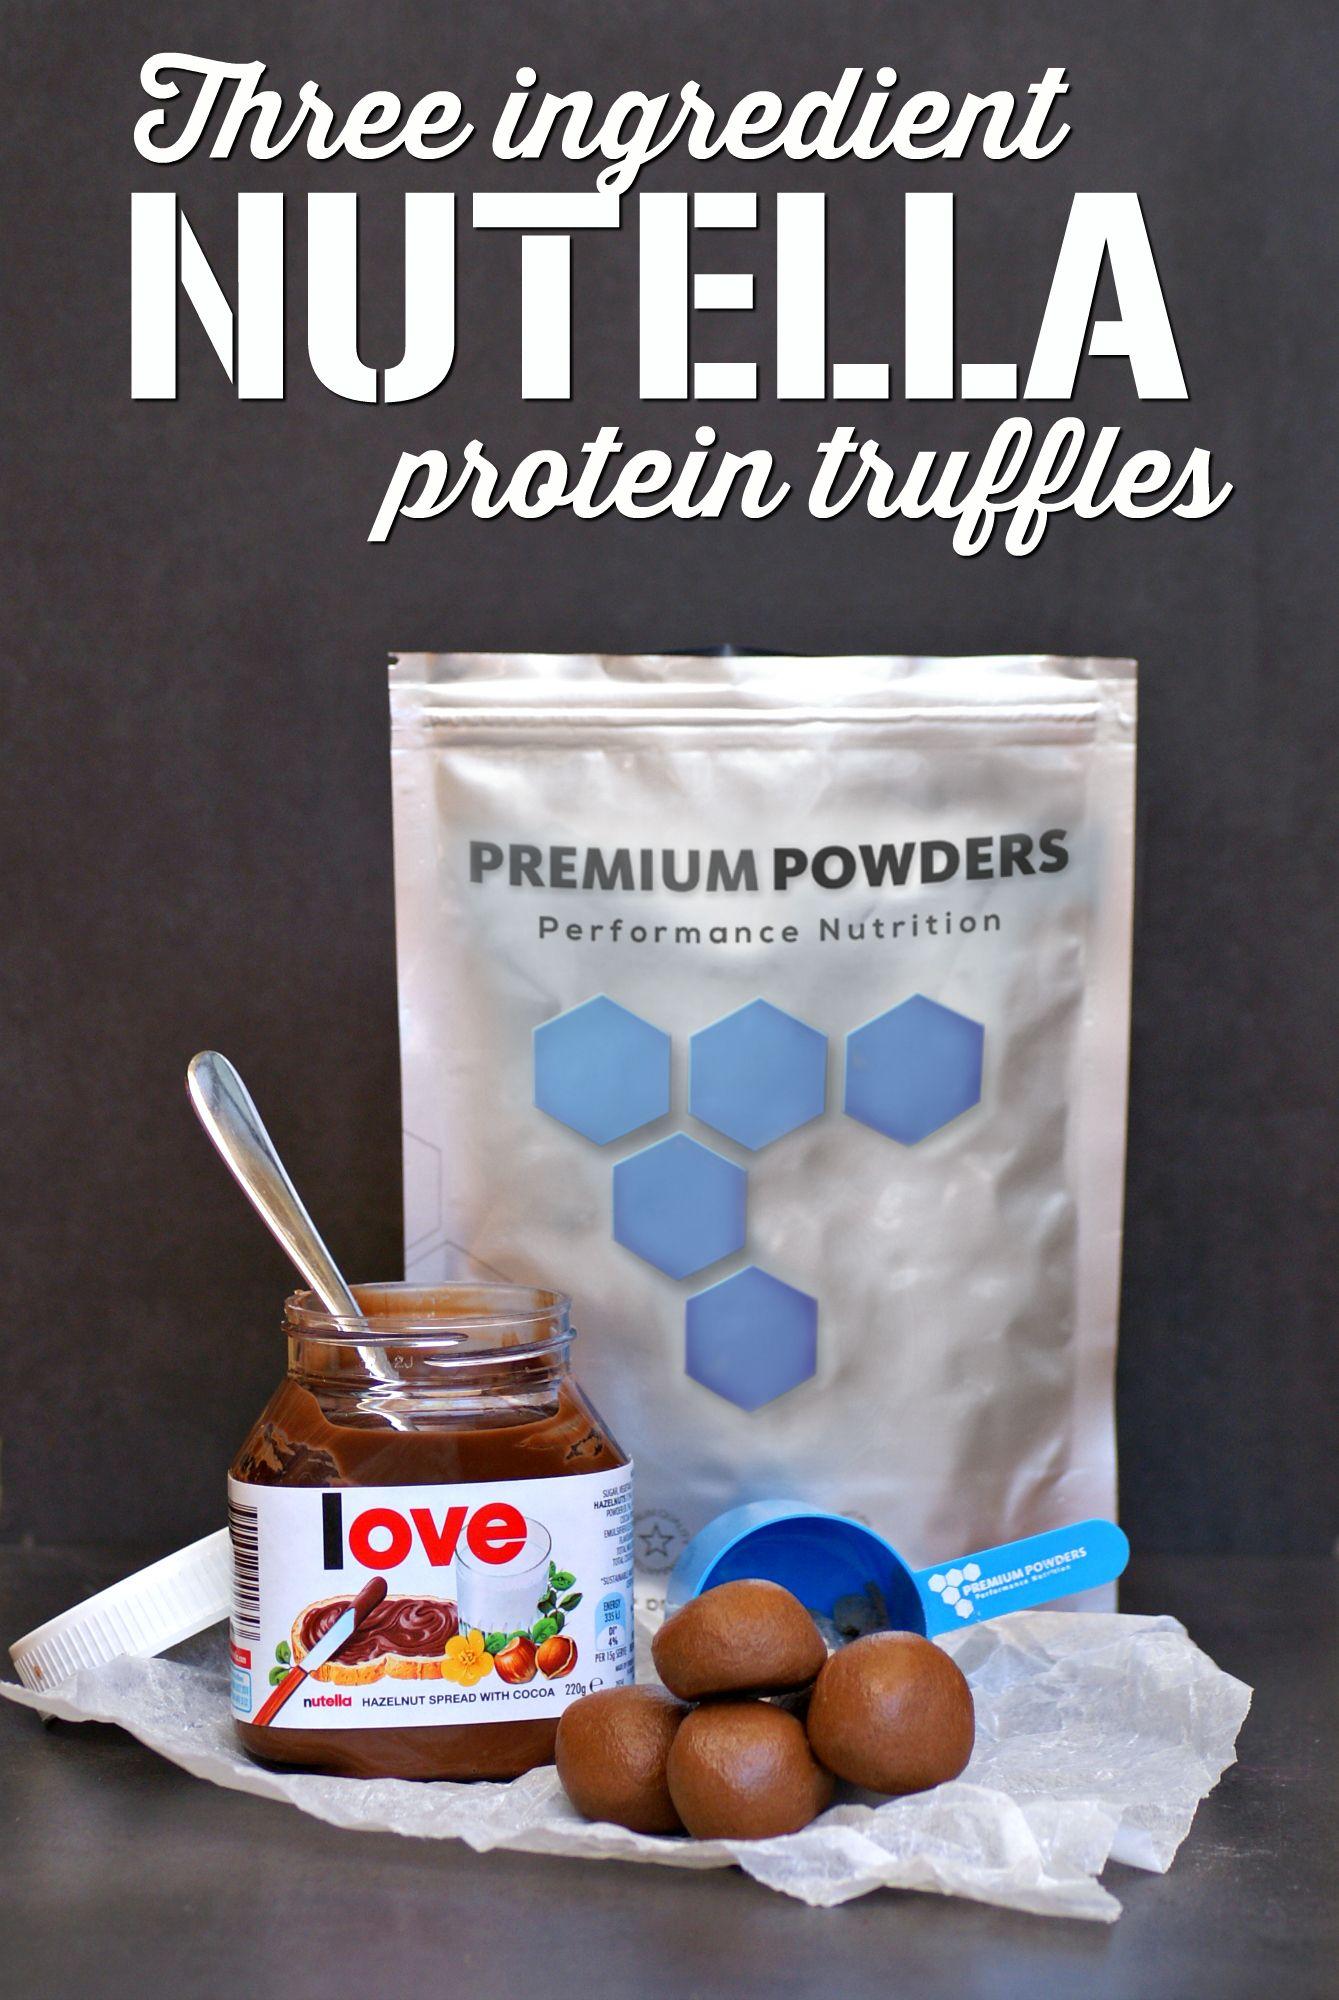 3 Ingredient Nutella Protein Truffles Recipe | NUTELLA